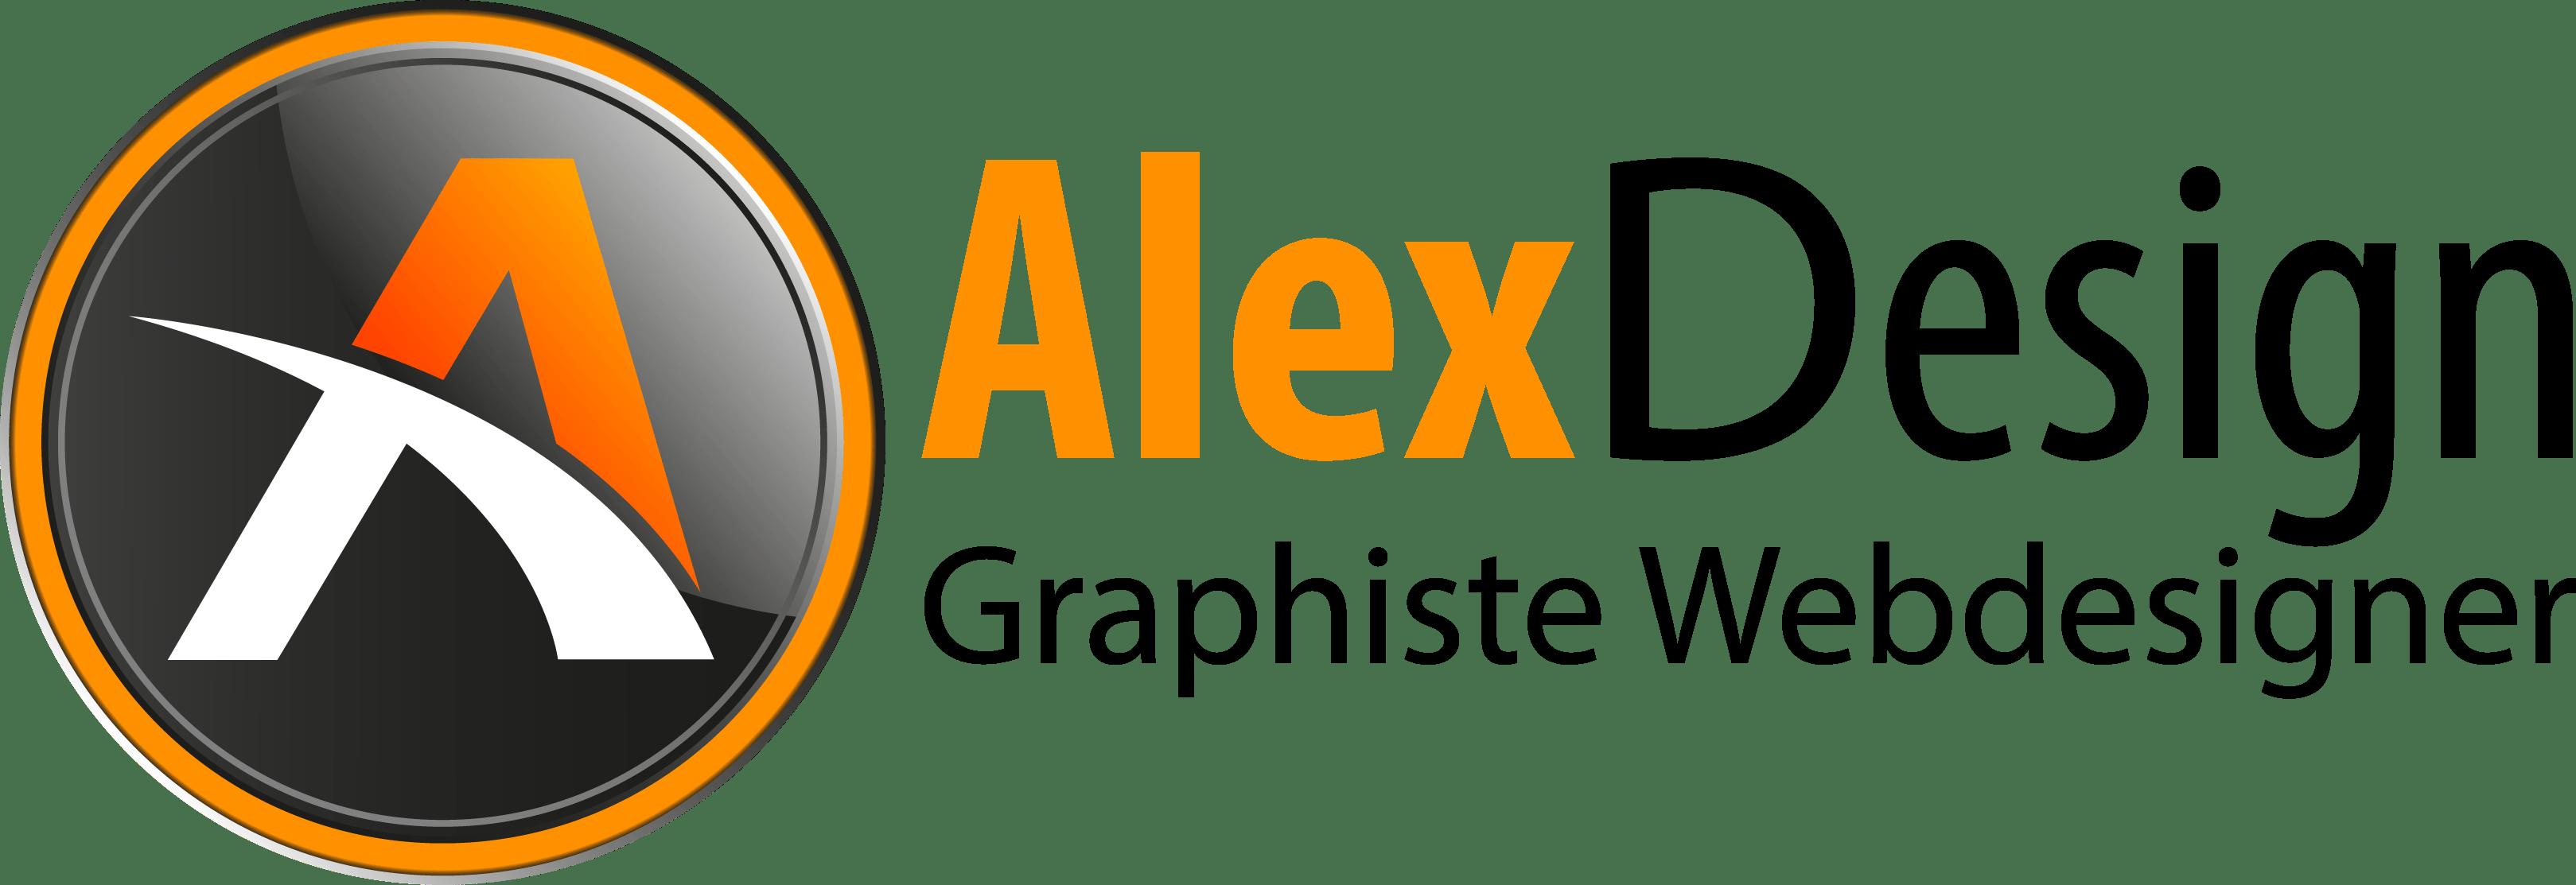 Alex Design Graphiste Webdesigner Freelance